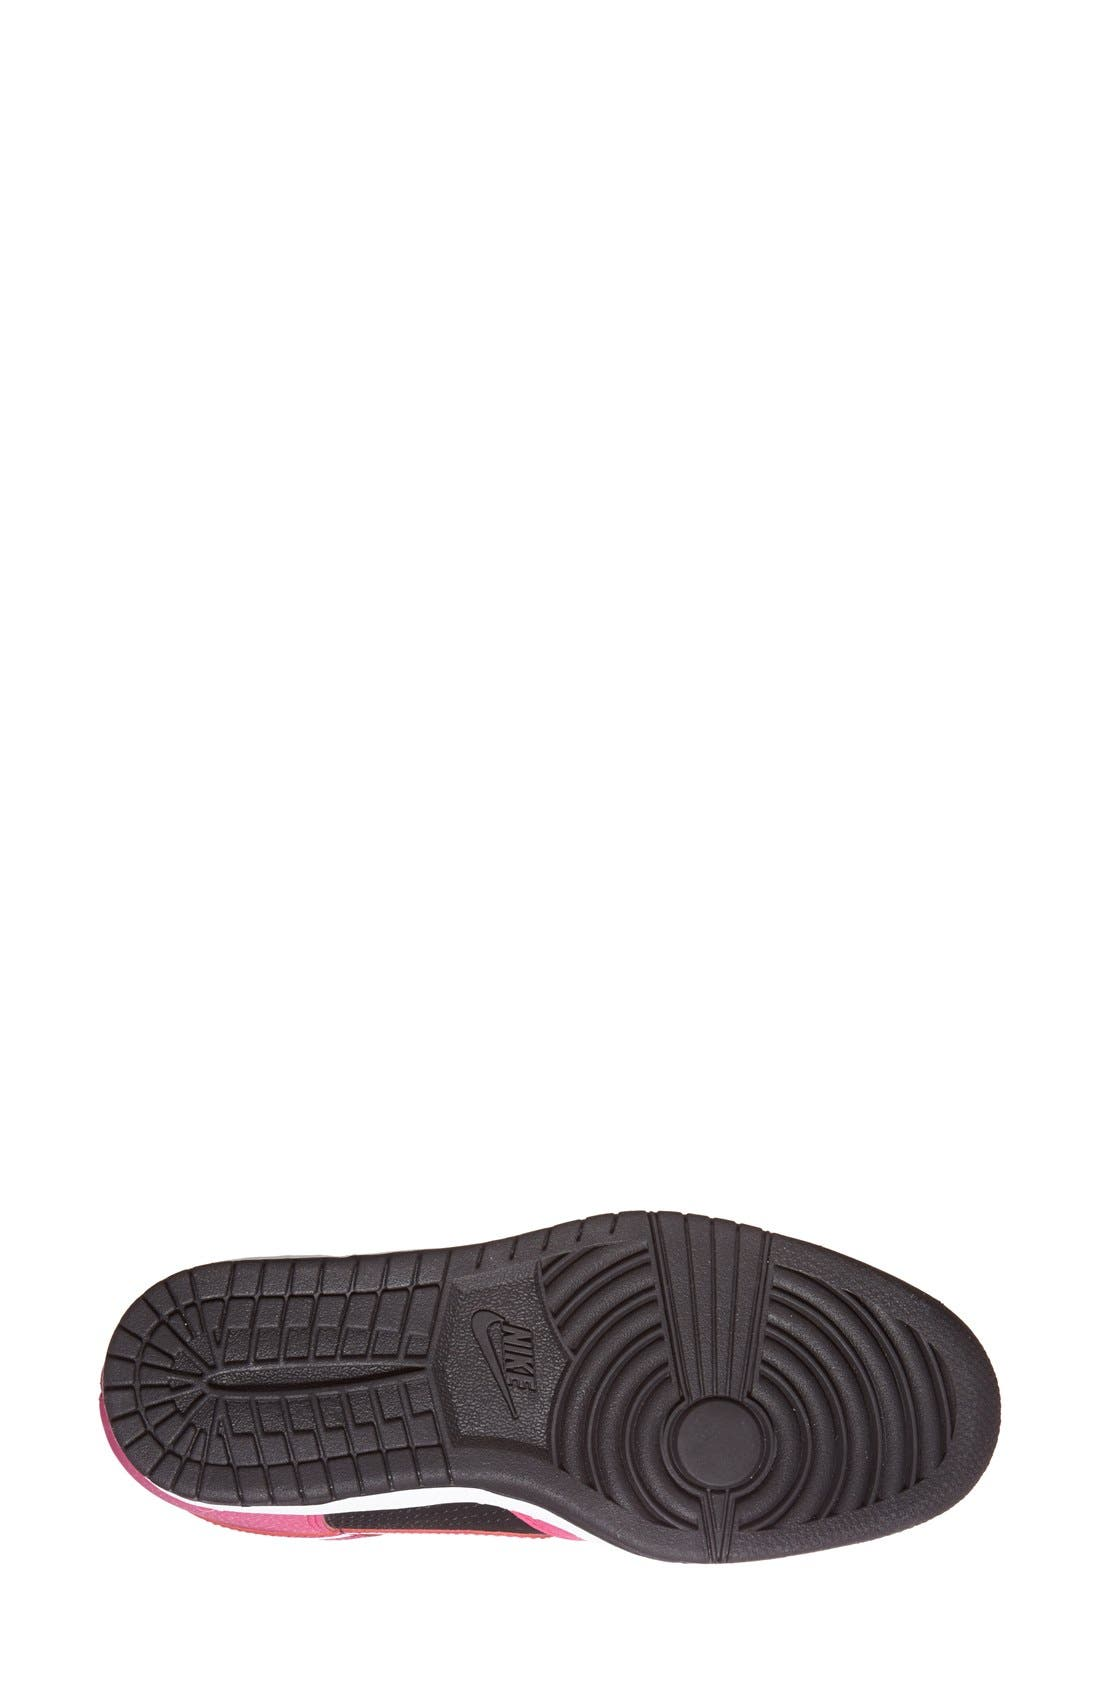 ,                             'Dunk Sky Hi - Essential' Wedge Sneaker,                             Alternate thumbnail 21, color,                             010